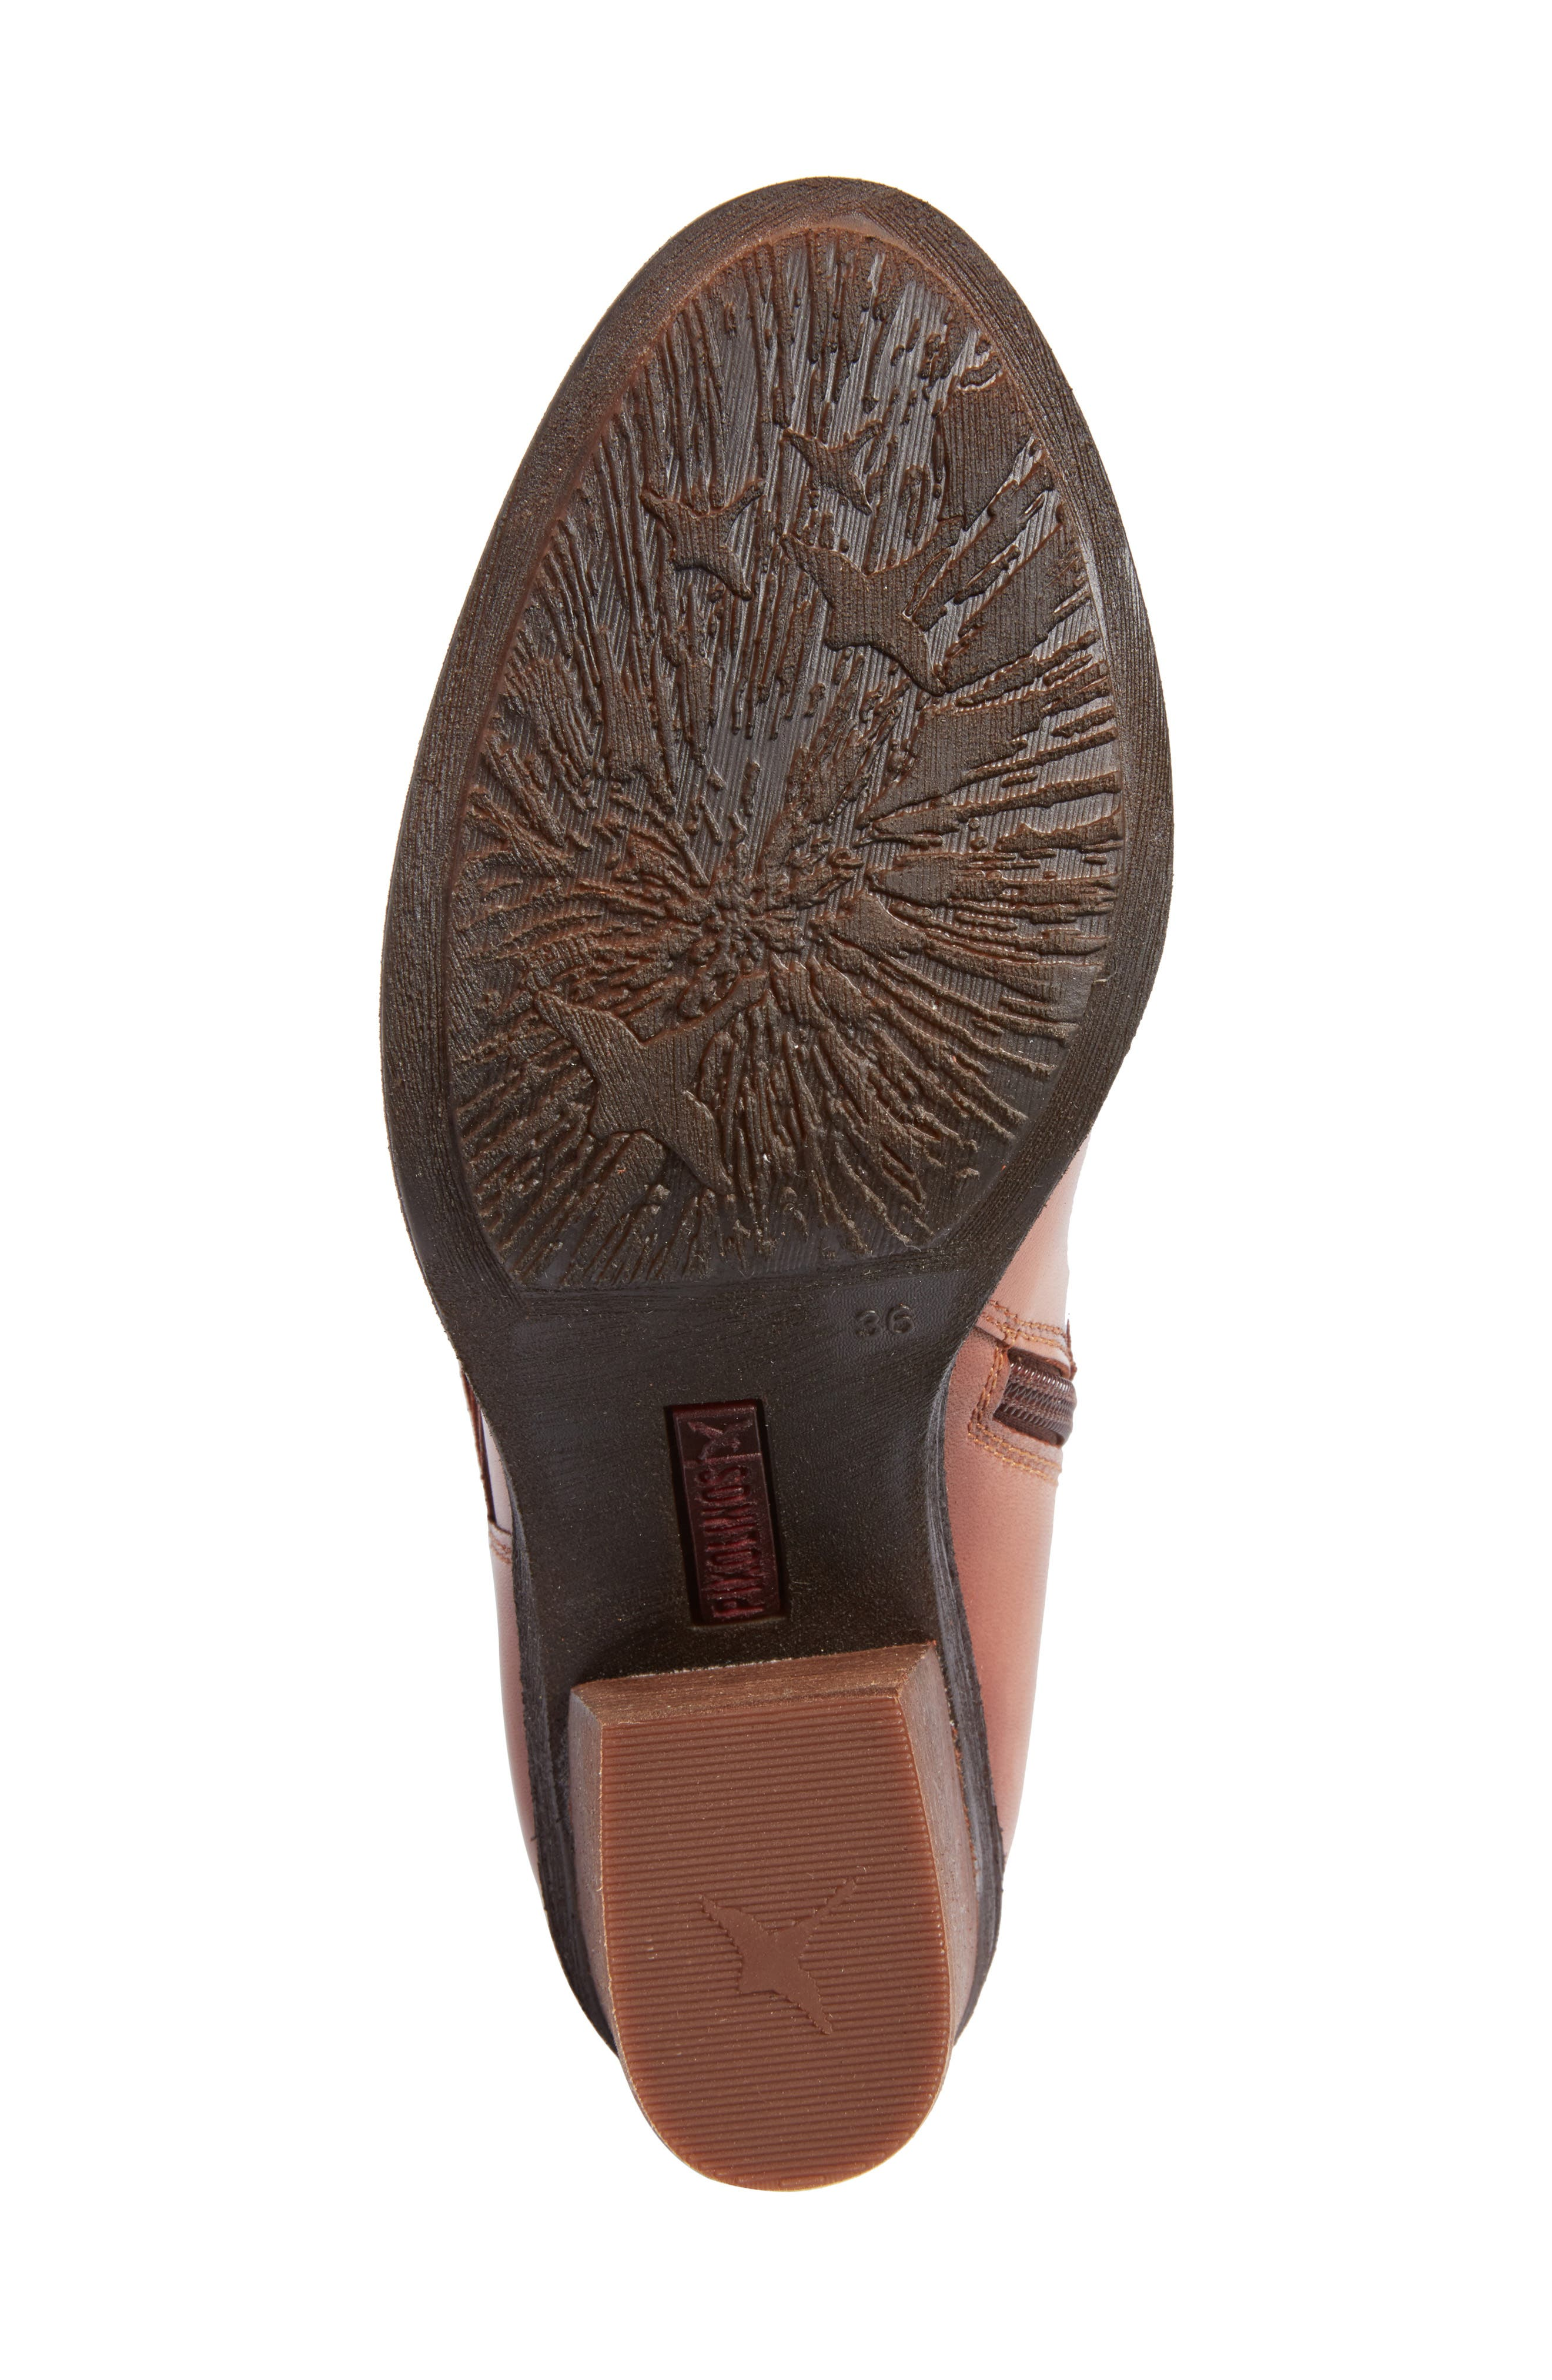 Alicante Bootie,                             Alternate thumbnail 6, color,                             Cuero Leather